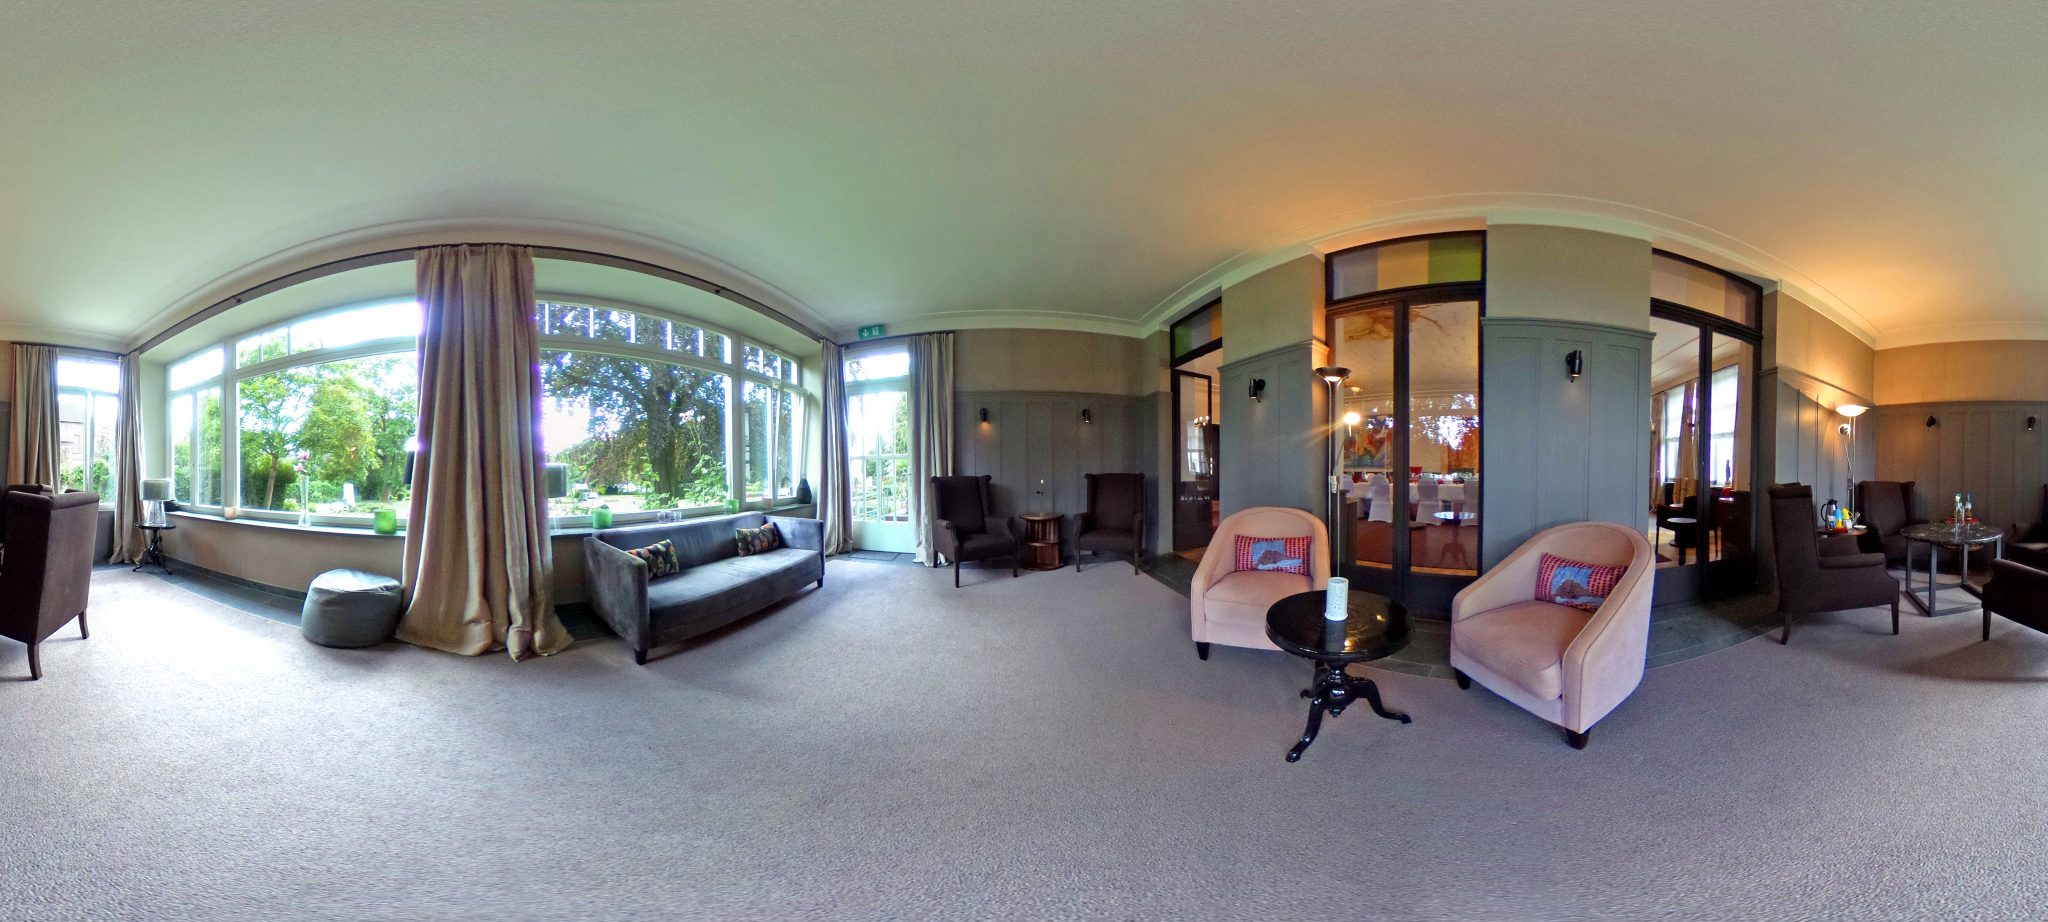 360 Grad Aufnahme Villa Leonhart Eventlocation